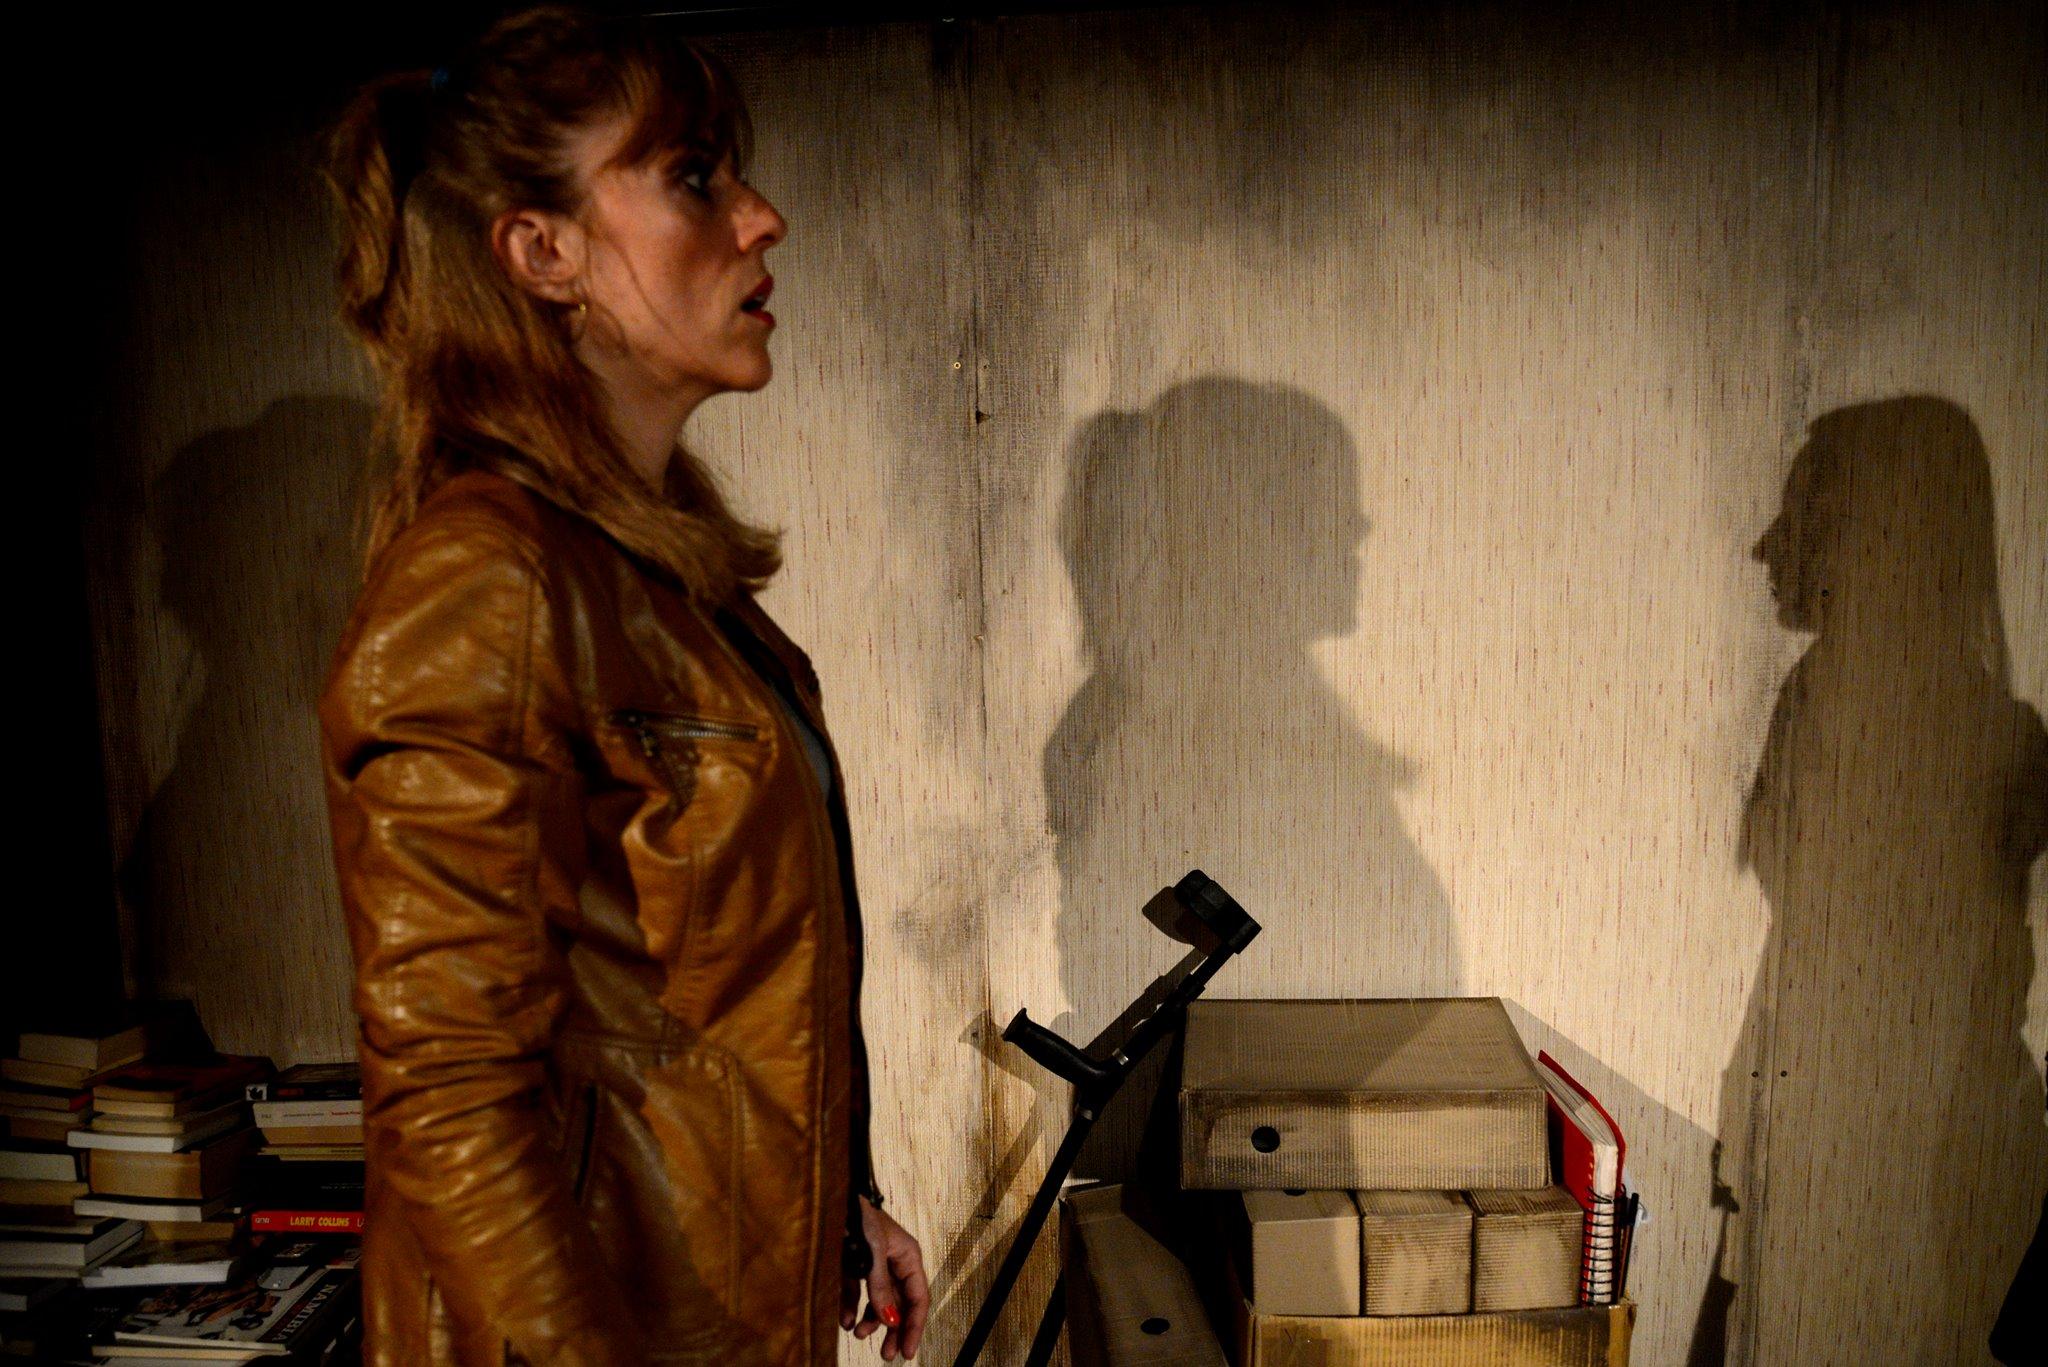 Gemma Deusedas a 'Es fa fosc', de Jordi Centelles, a la Sala Flyhard. @ Roser Blanch